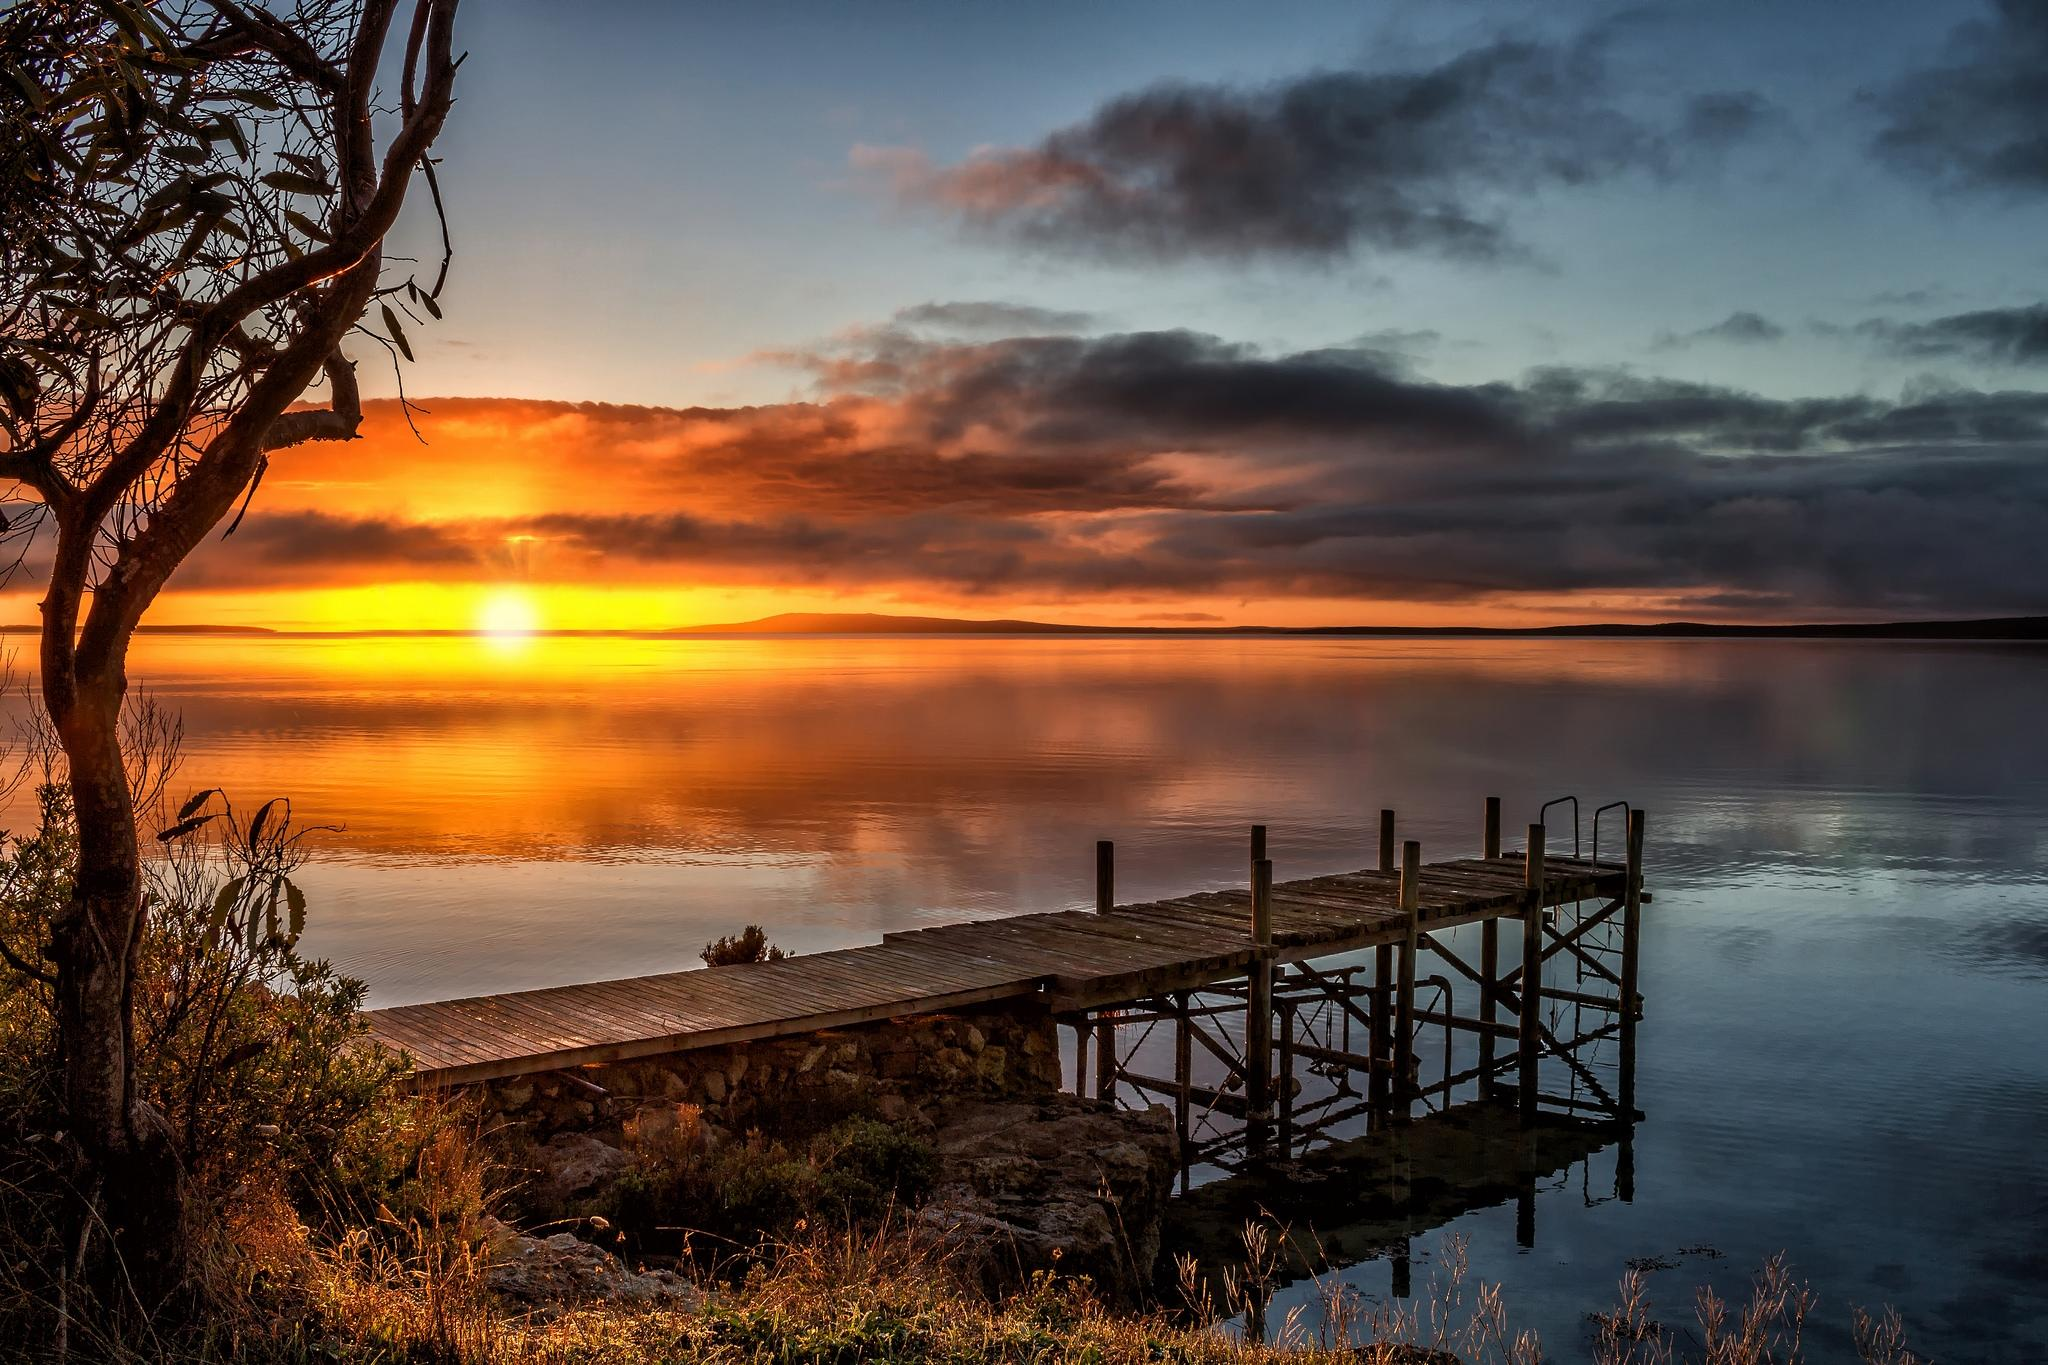 обои озеро, закат, пирс, причал картинки фото